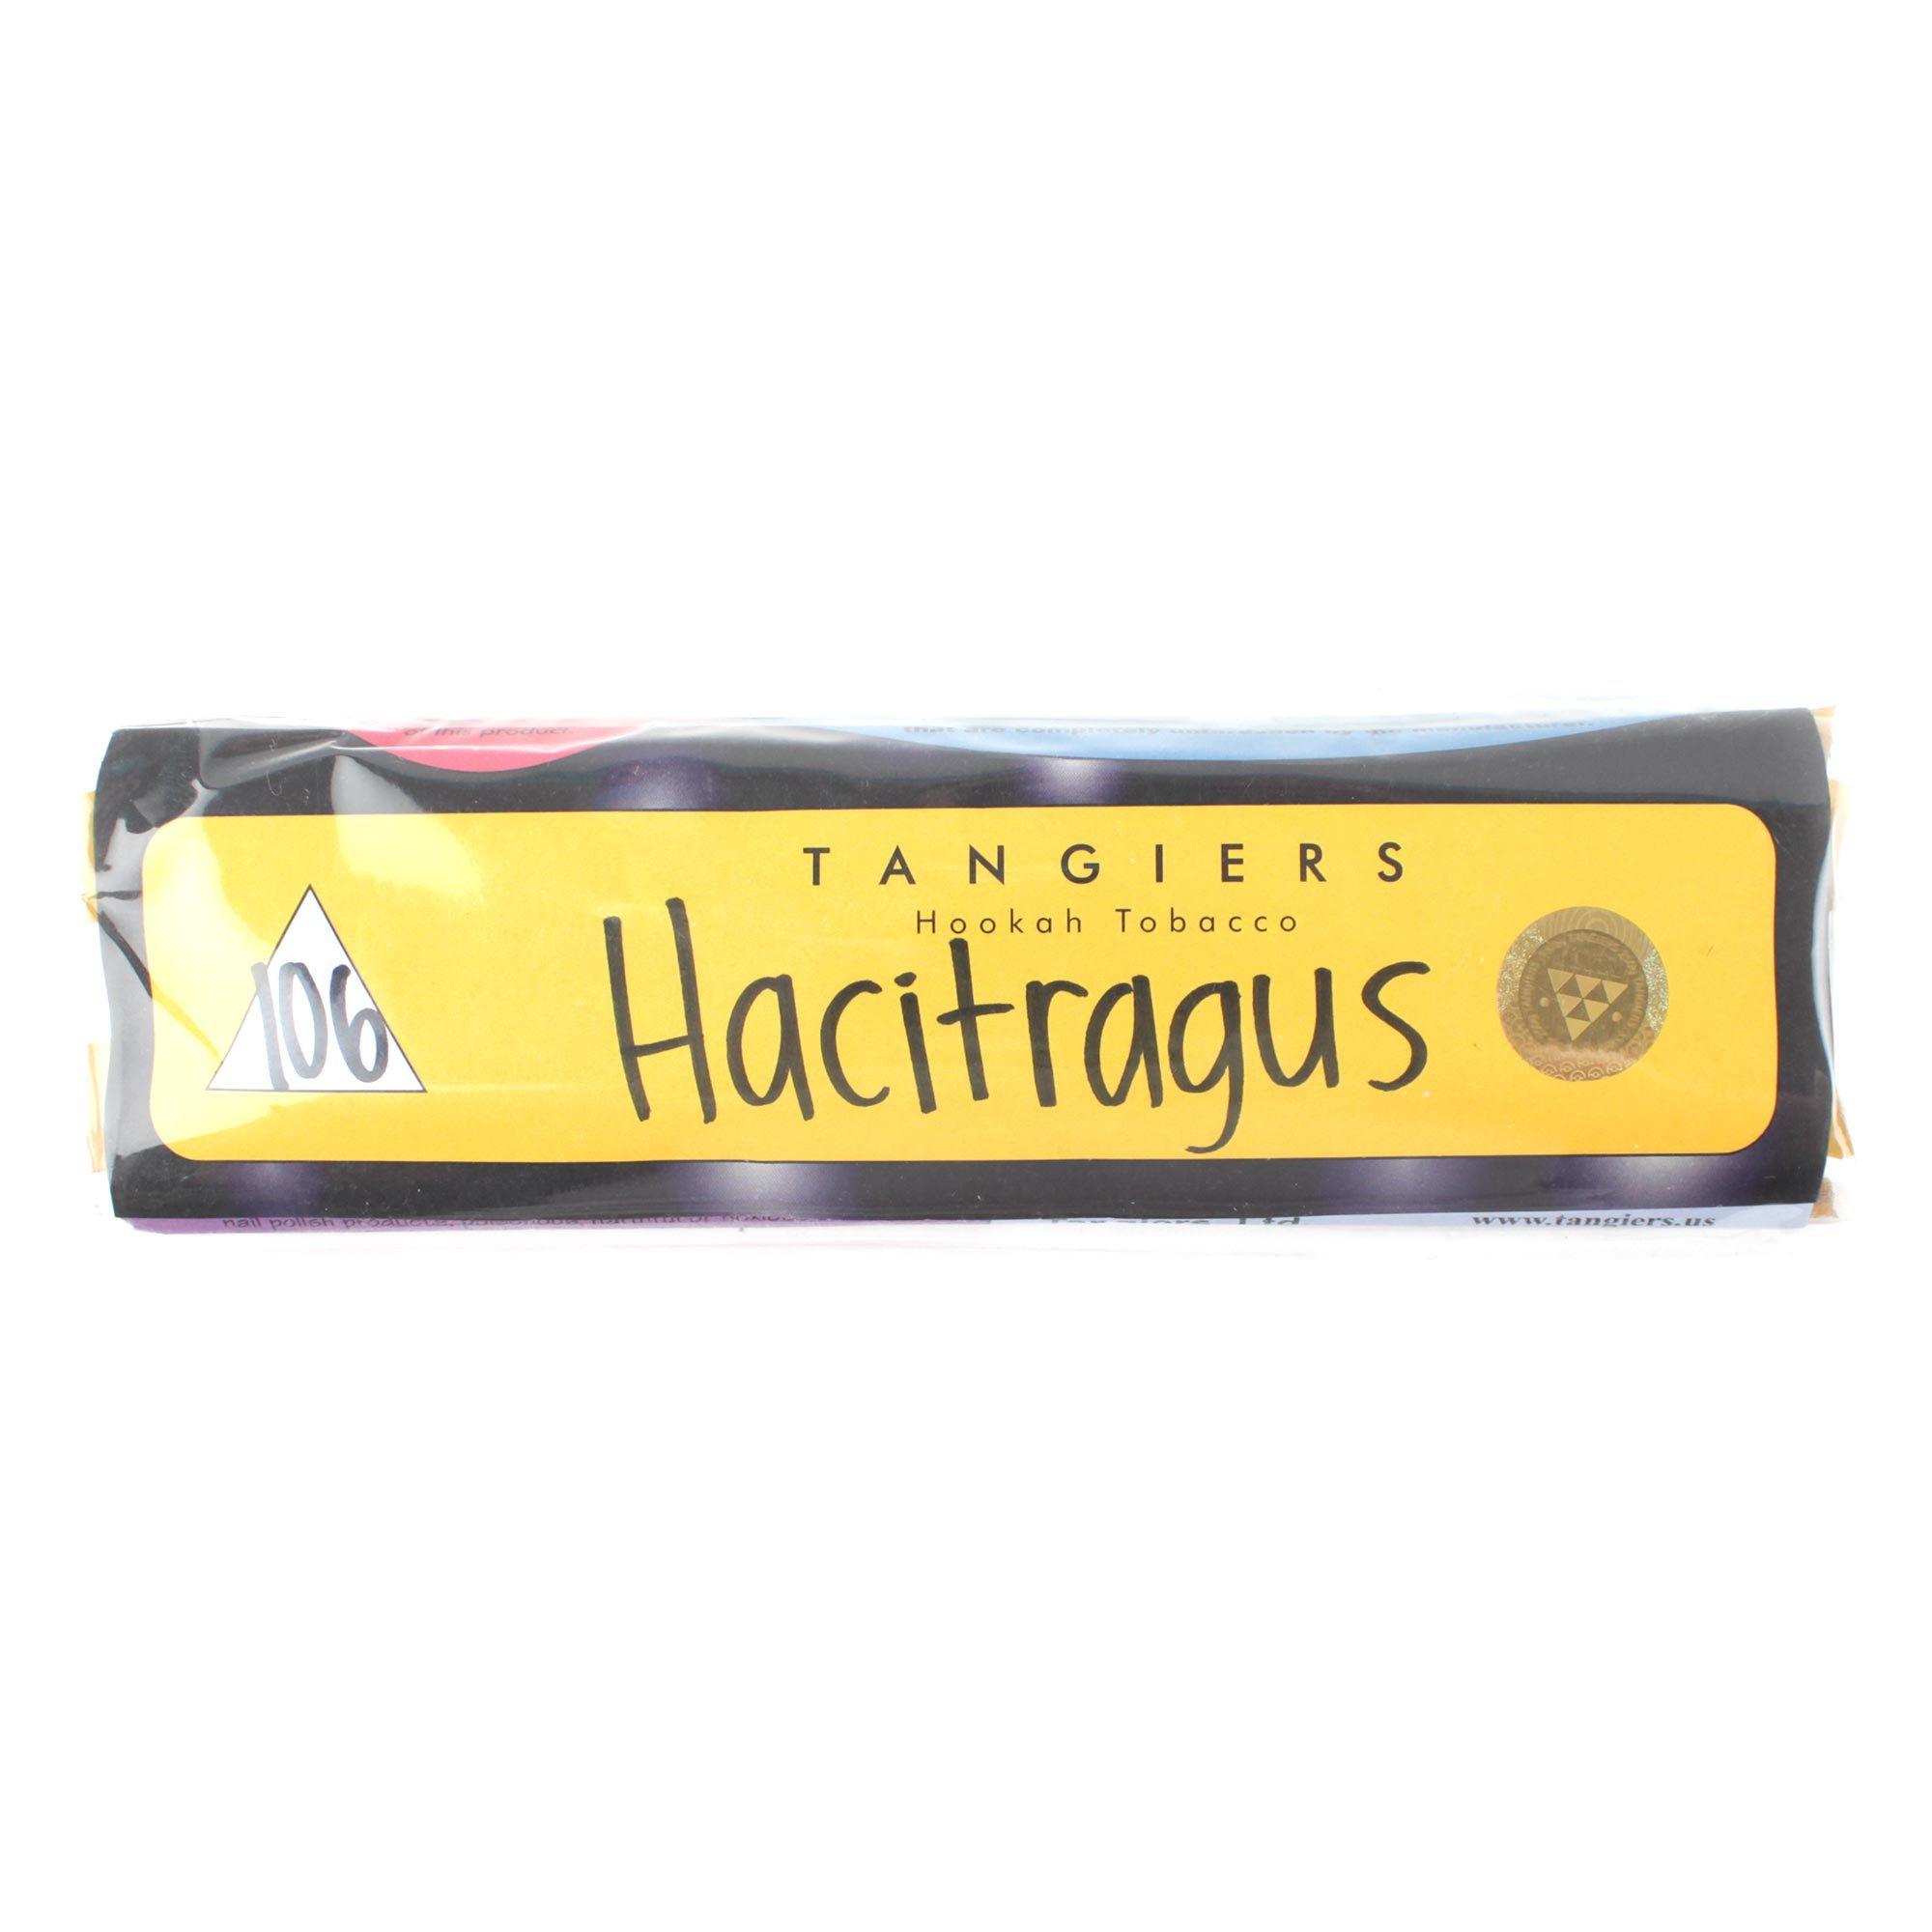 Табак для кальяна Tangiers Noir (желтый) 106 Hacitragus 250 гр